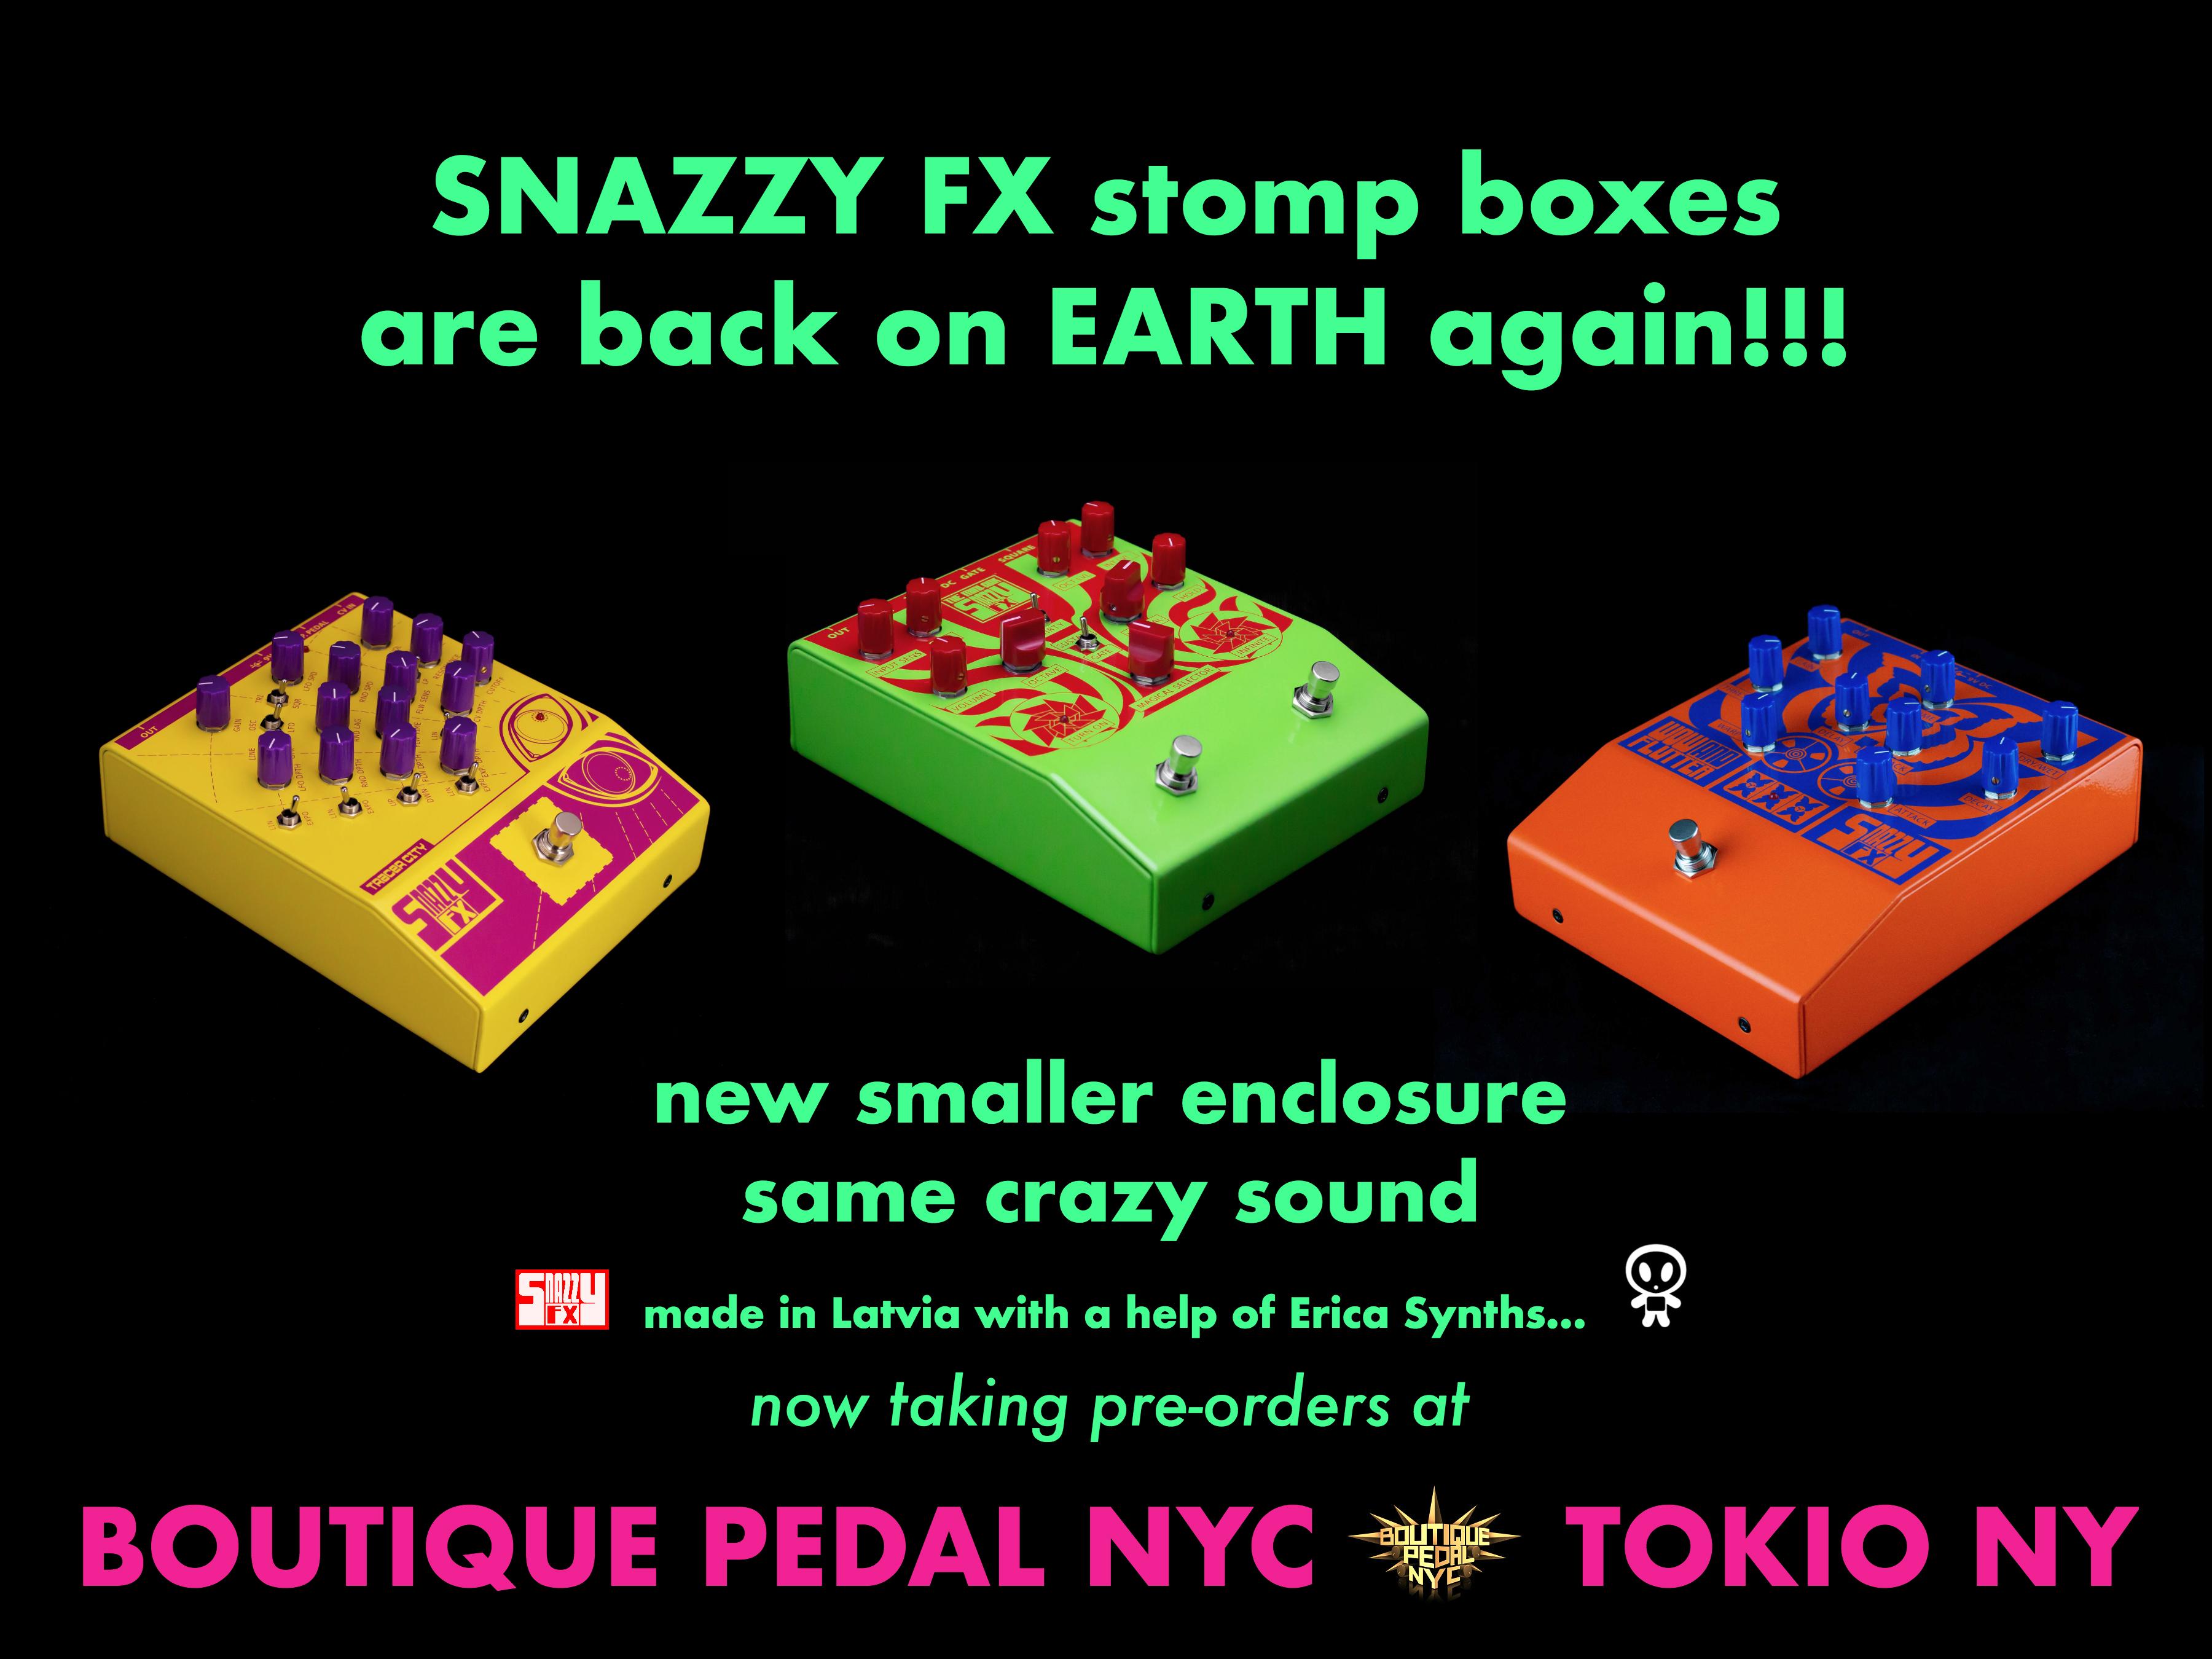 snazzy-fx-densetsu-3600x2700-pre-order-final.jpg